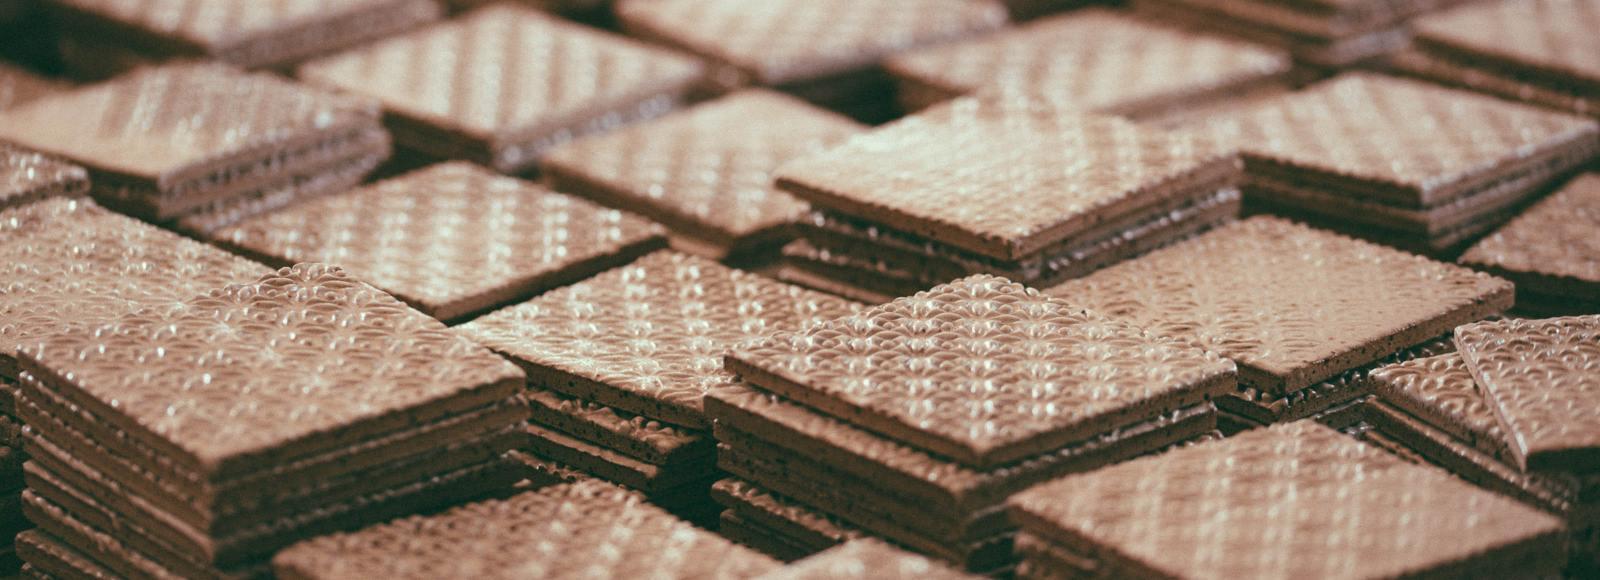 Handmade ceramic tiles devol kitchens handmade ceramic tiles photo 6 dailygadgetfo Gallery